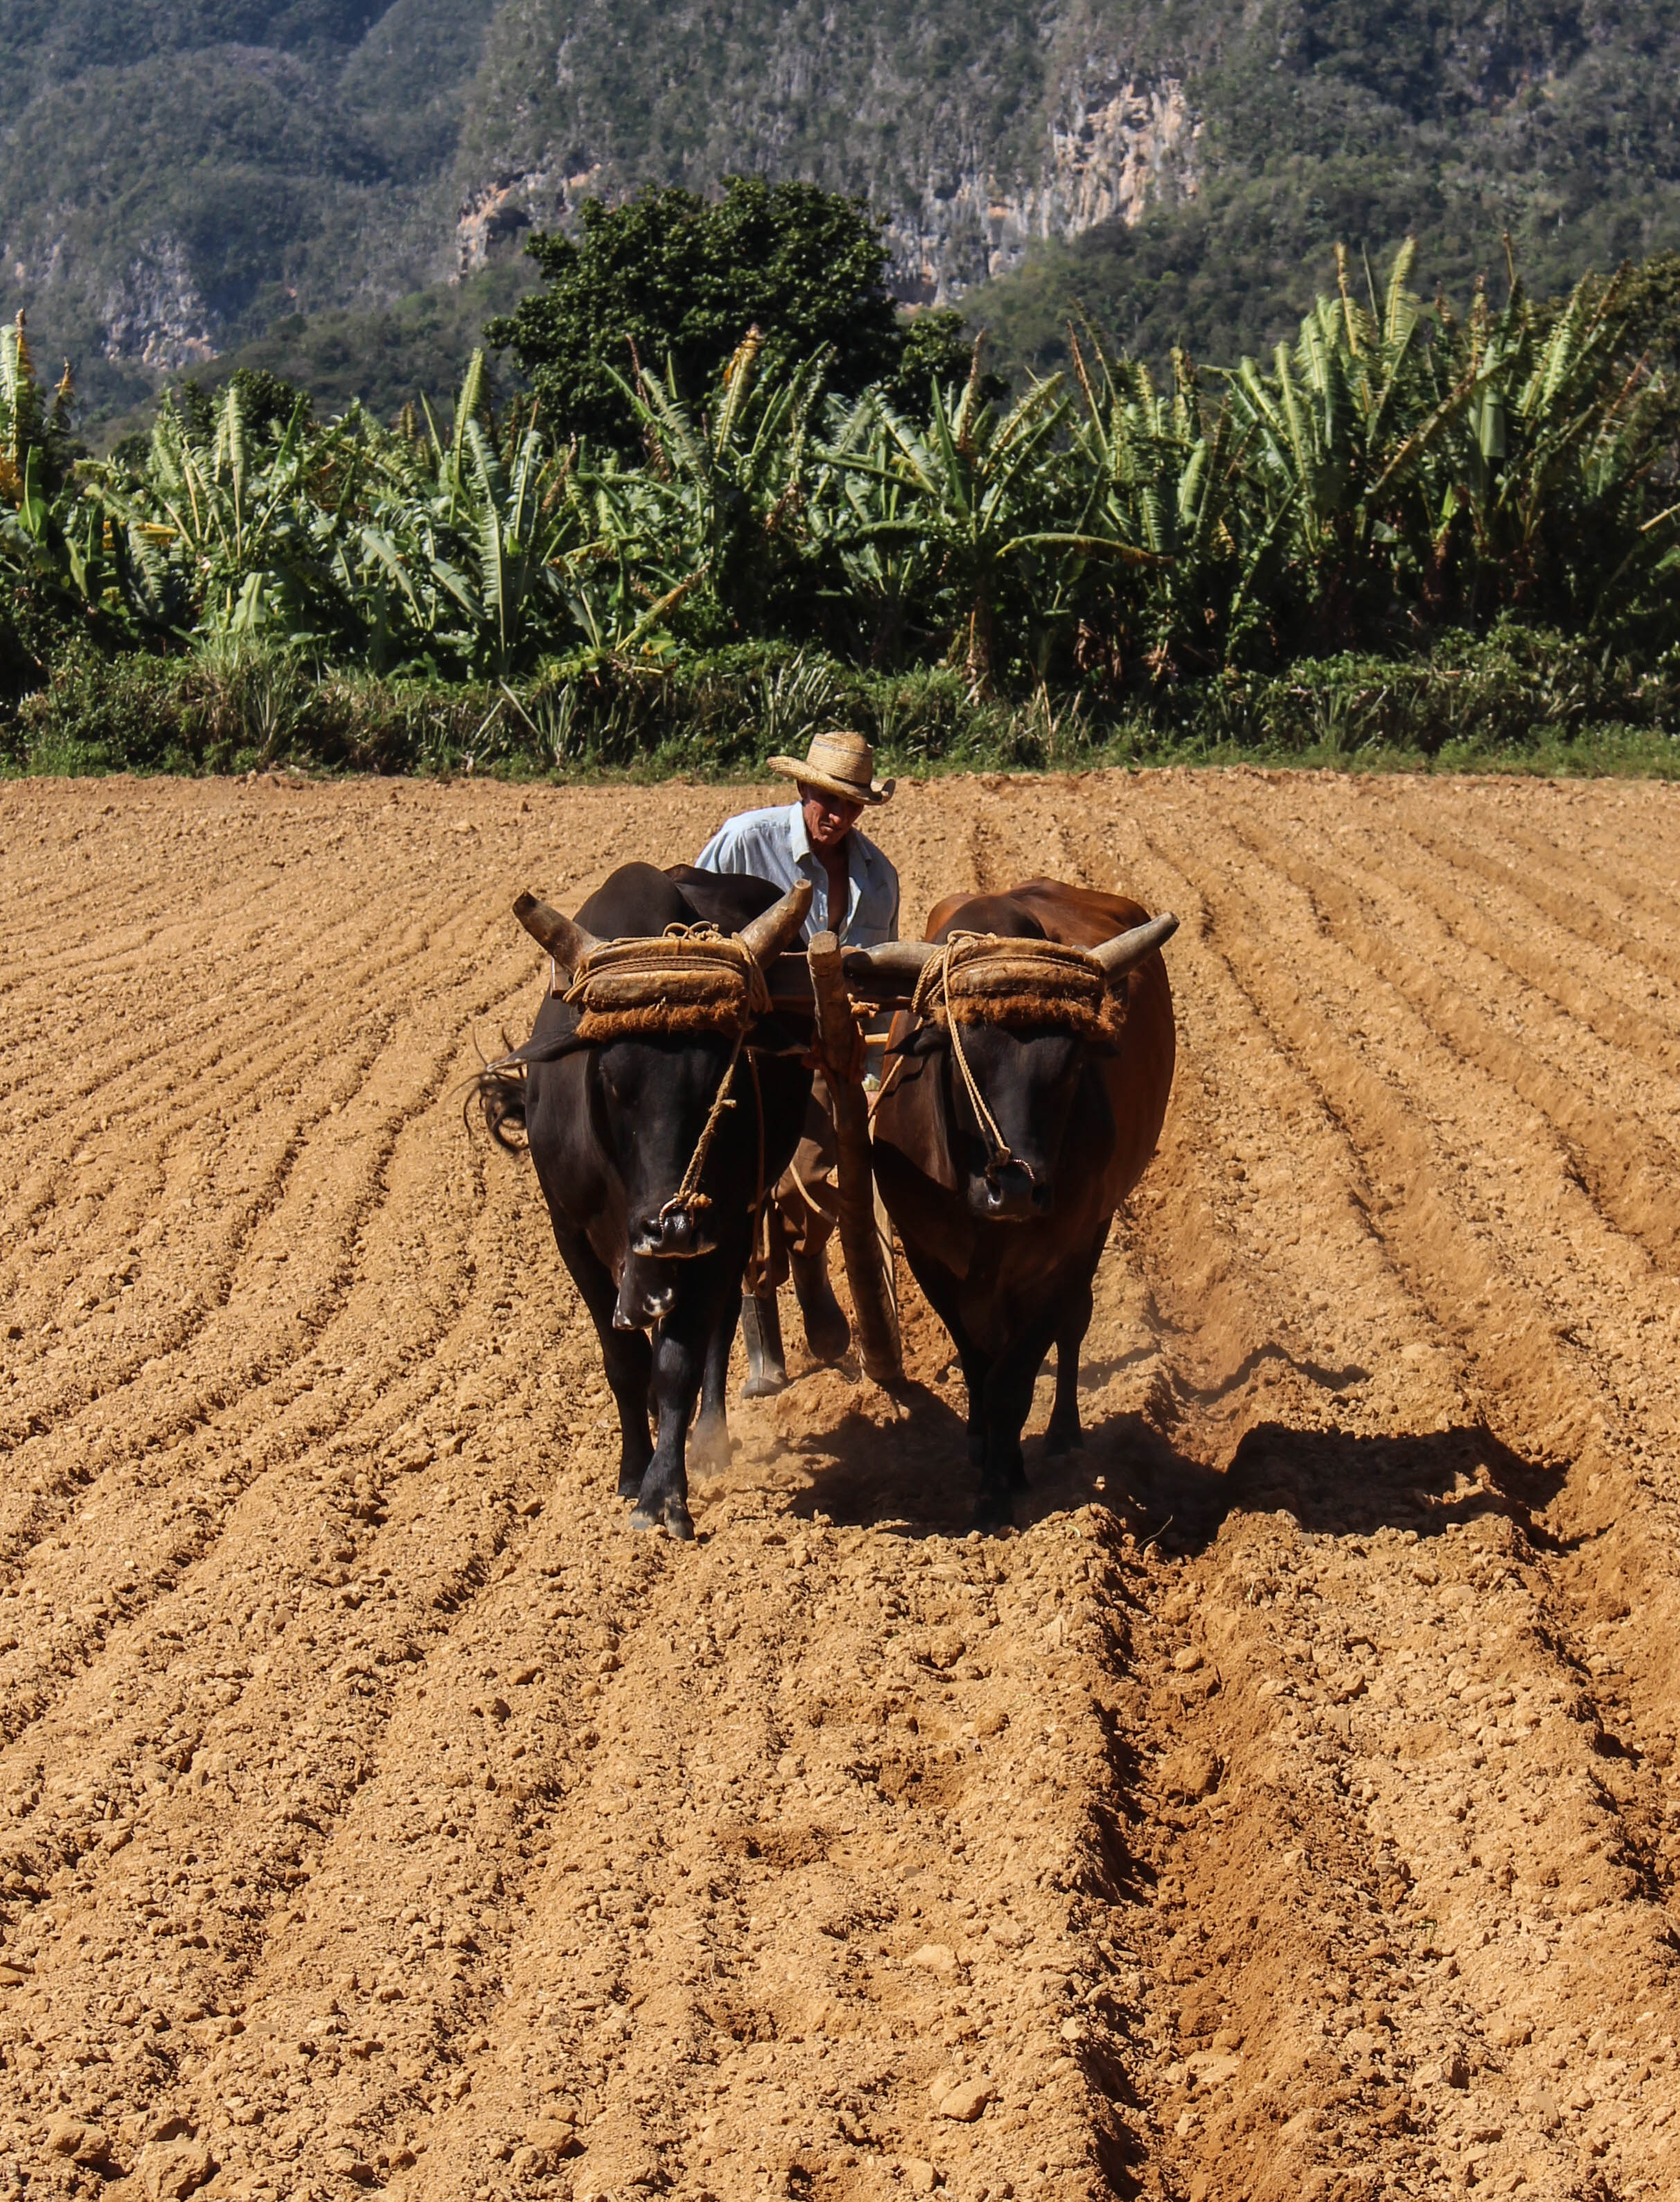 Rudimentary Cuban farming techniques